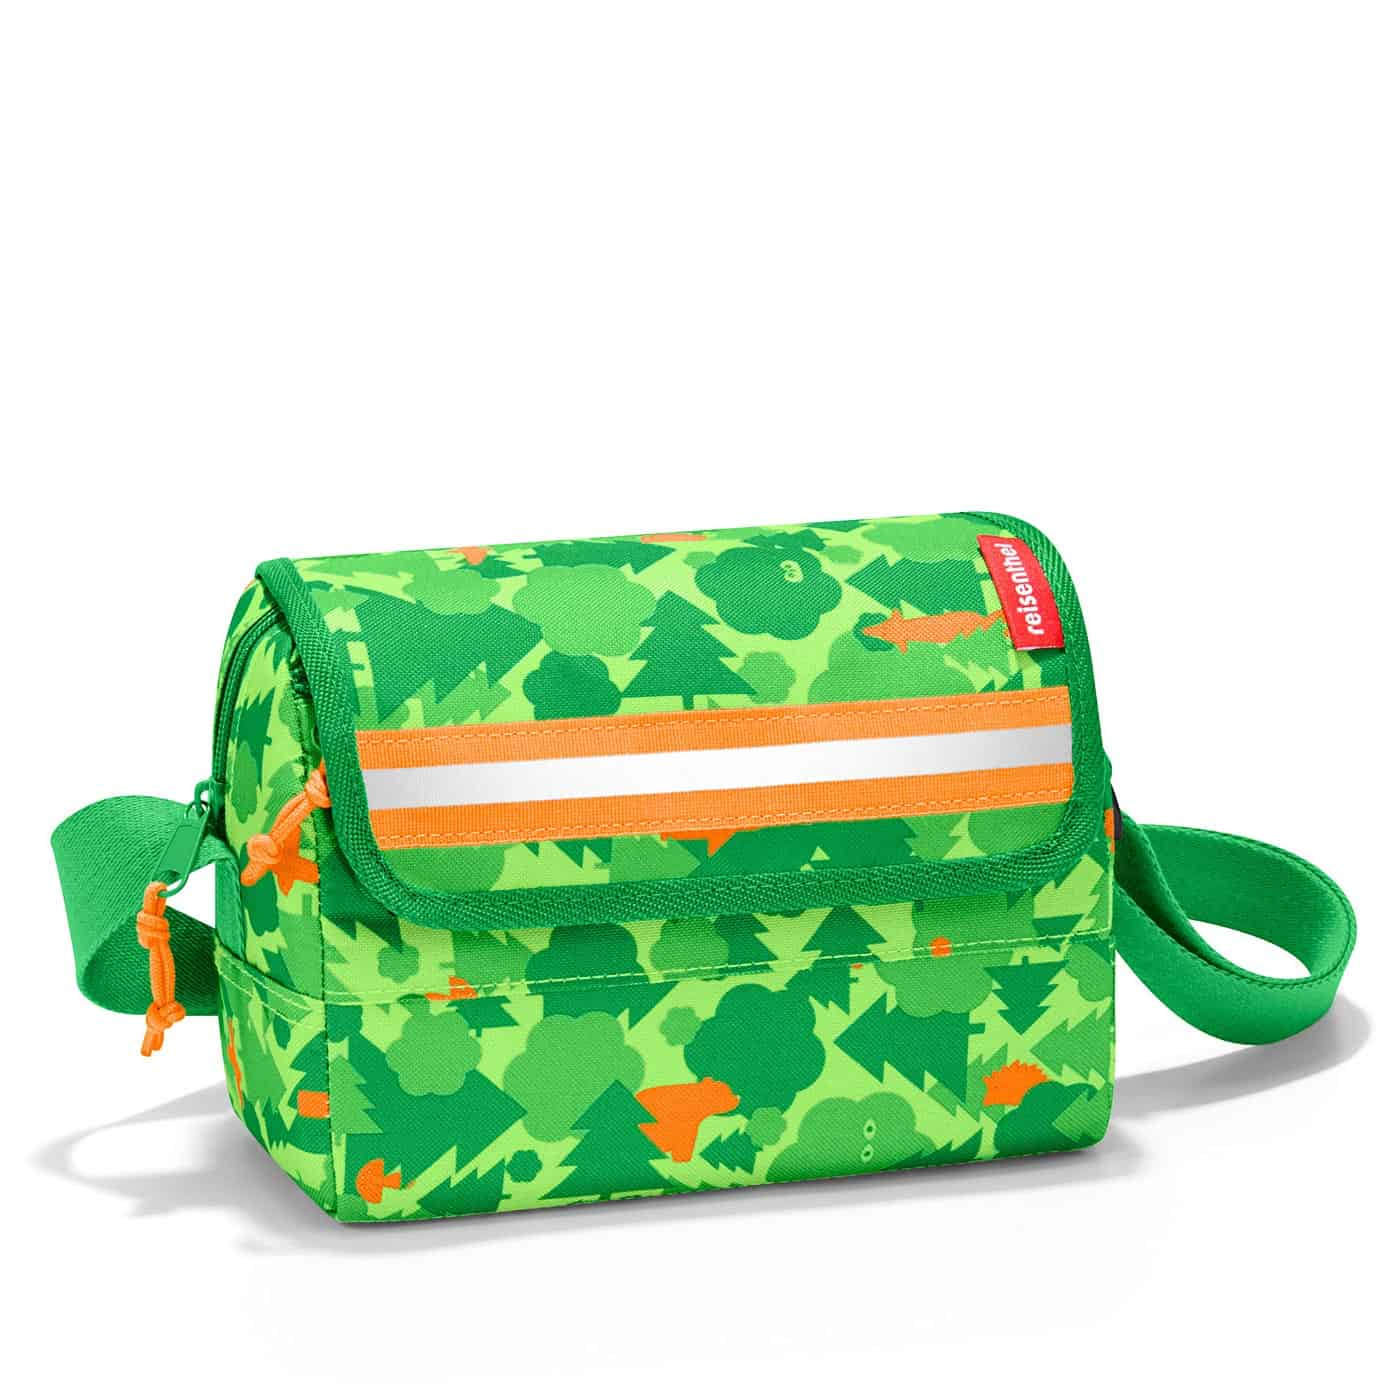 reisenthel everydaybag school nursery lunch crossbody shoulder bag 3 colours david viggers ltd. Black Bedroom Furniture Sets. Home Design Ideas